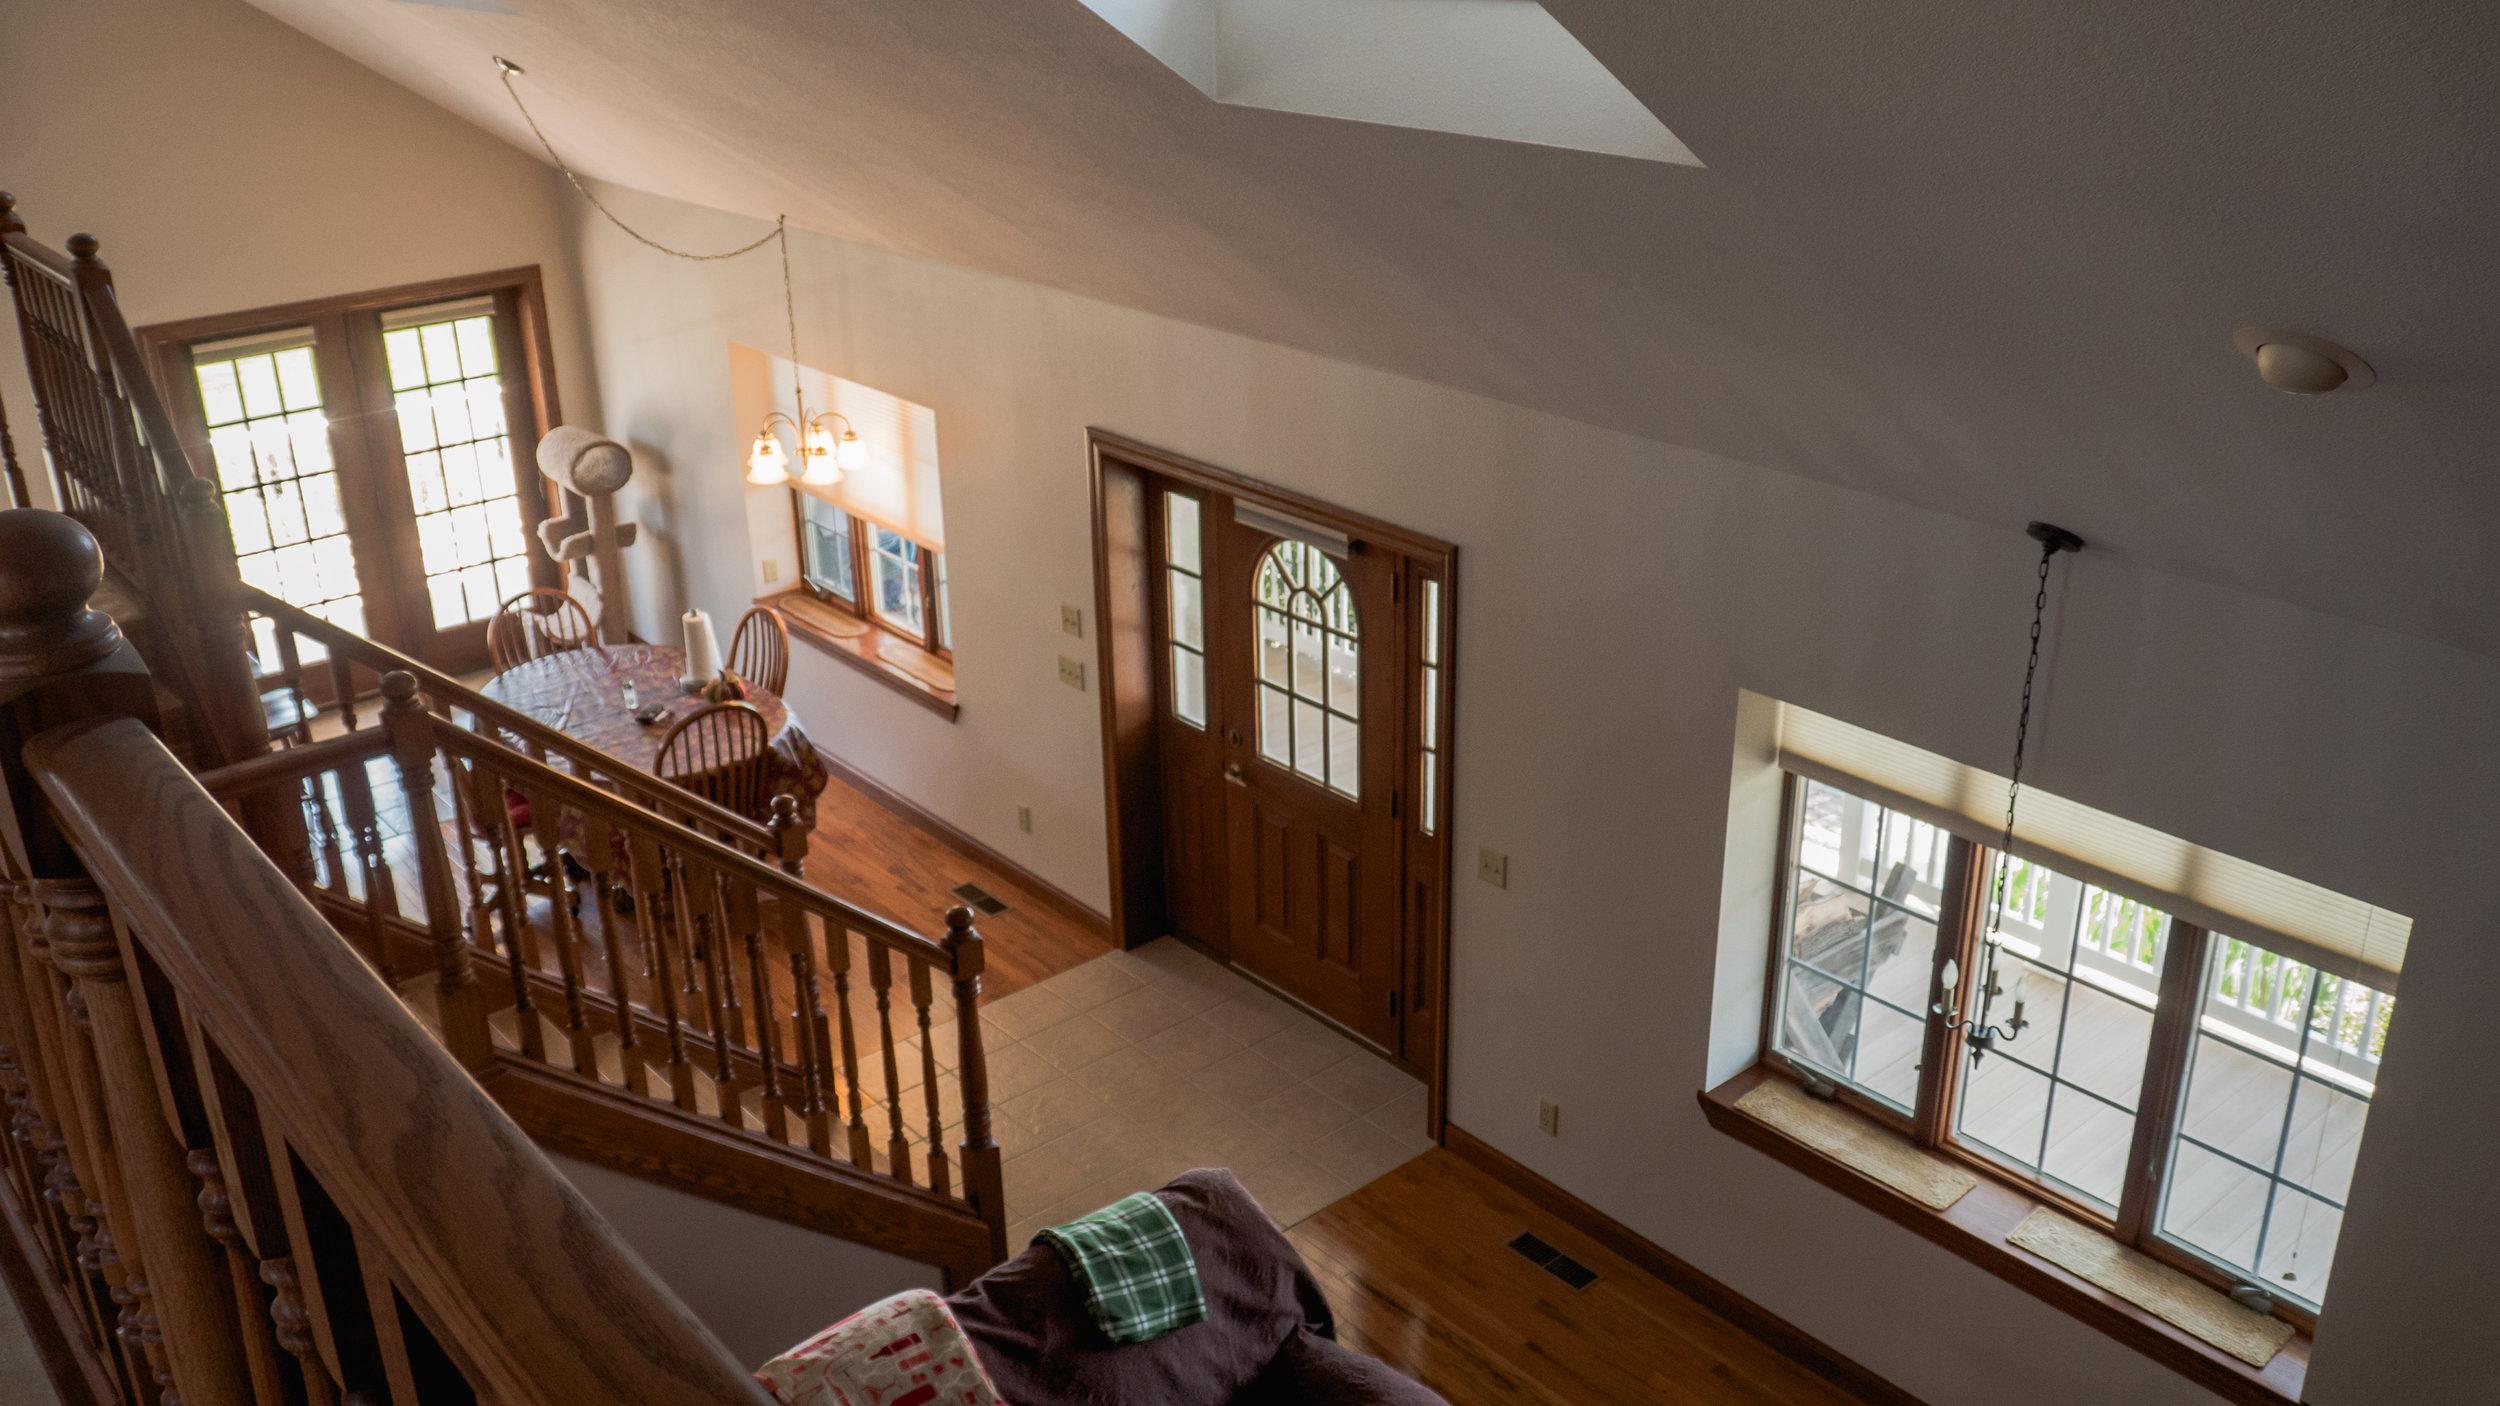 Interior Photos - Click to view gallery